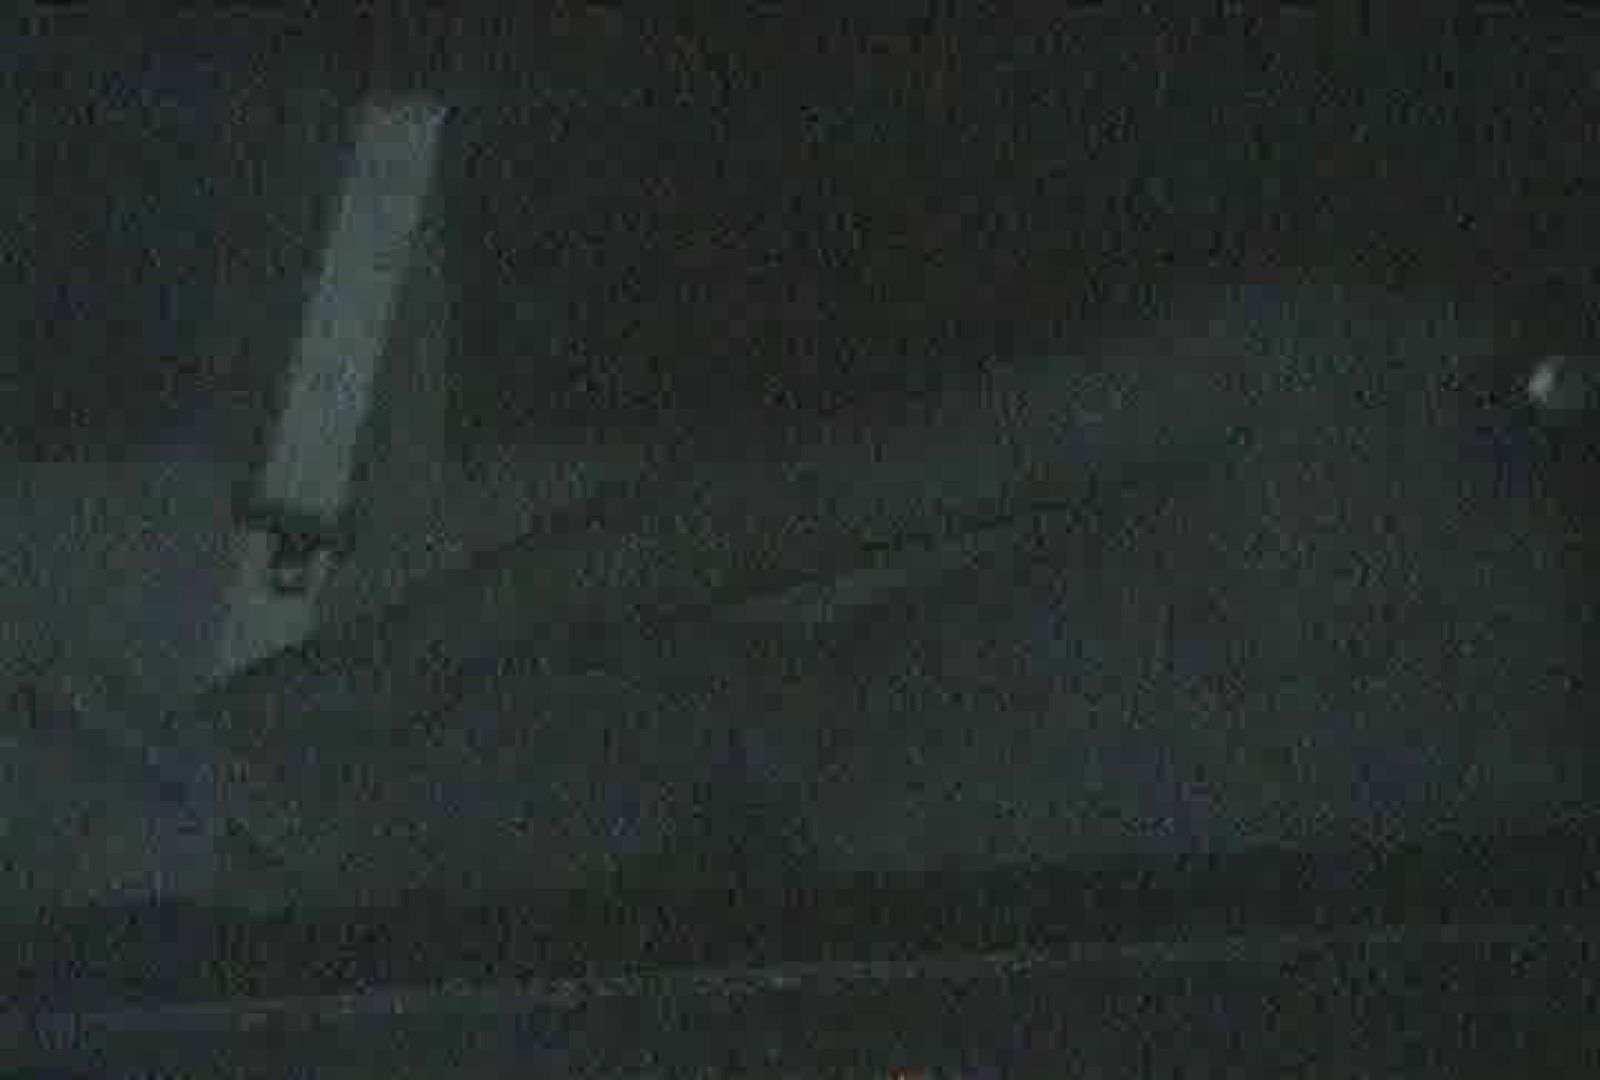 充血監督の深夜の運動会Vol.86 接写 セックス無修正動画無料 98画像 67